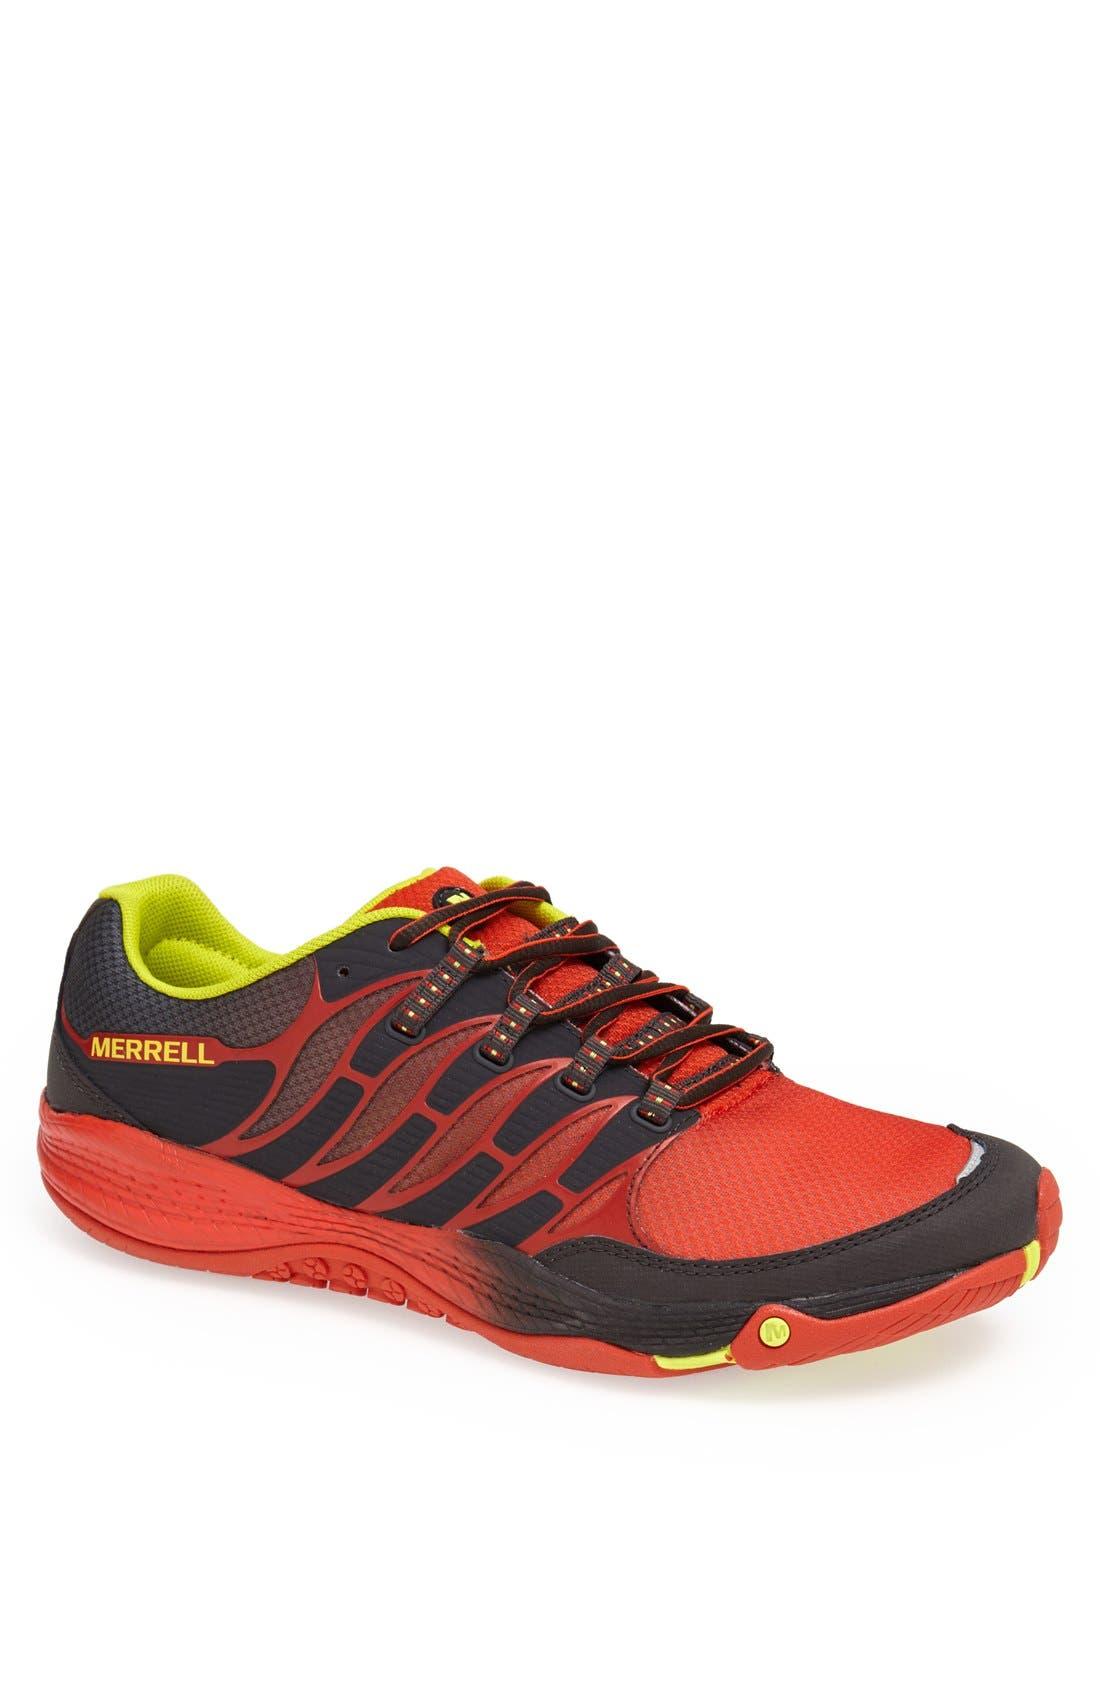 Alternate Image 1 Selected - Merrell 'Allout Fuse' Trail Running Shoe (Men)